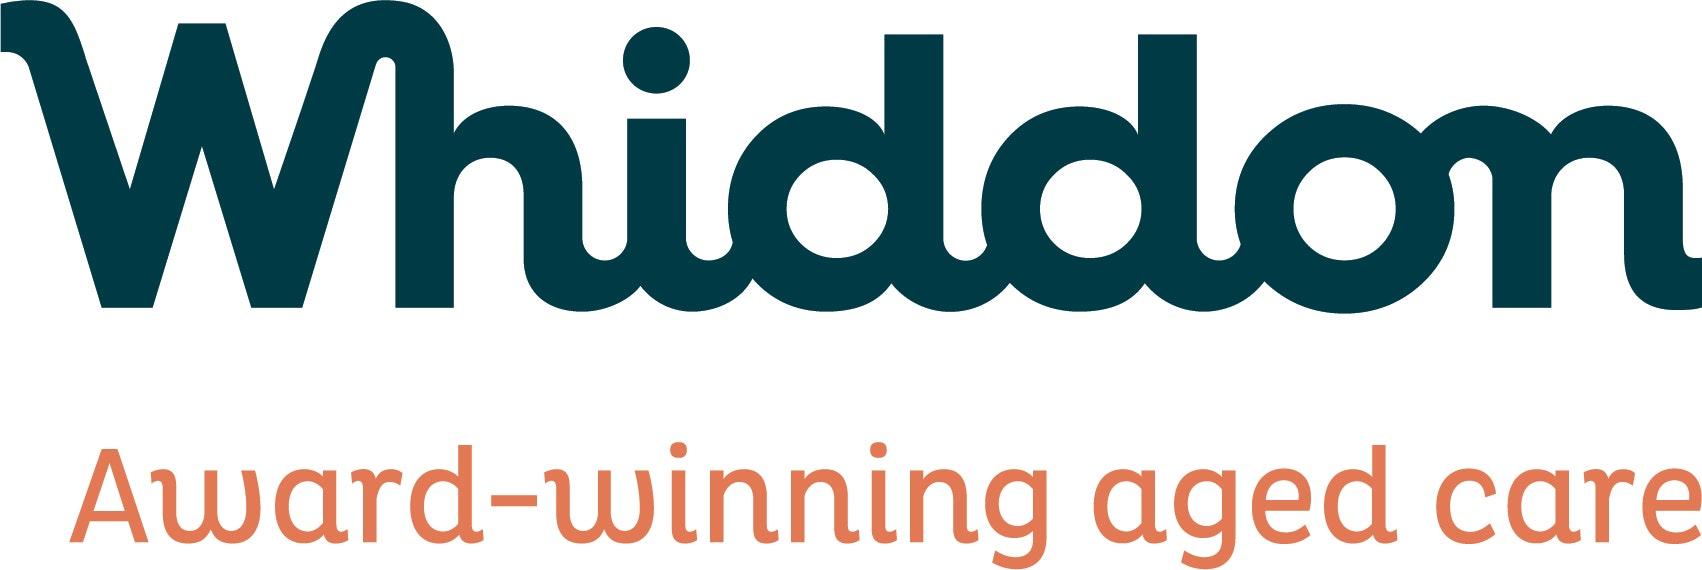 Whiddon Grafton logo